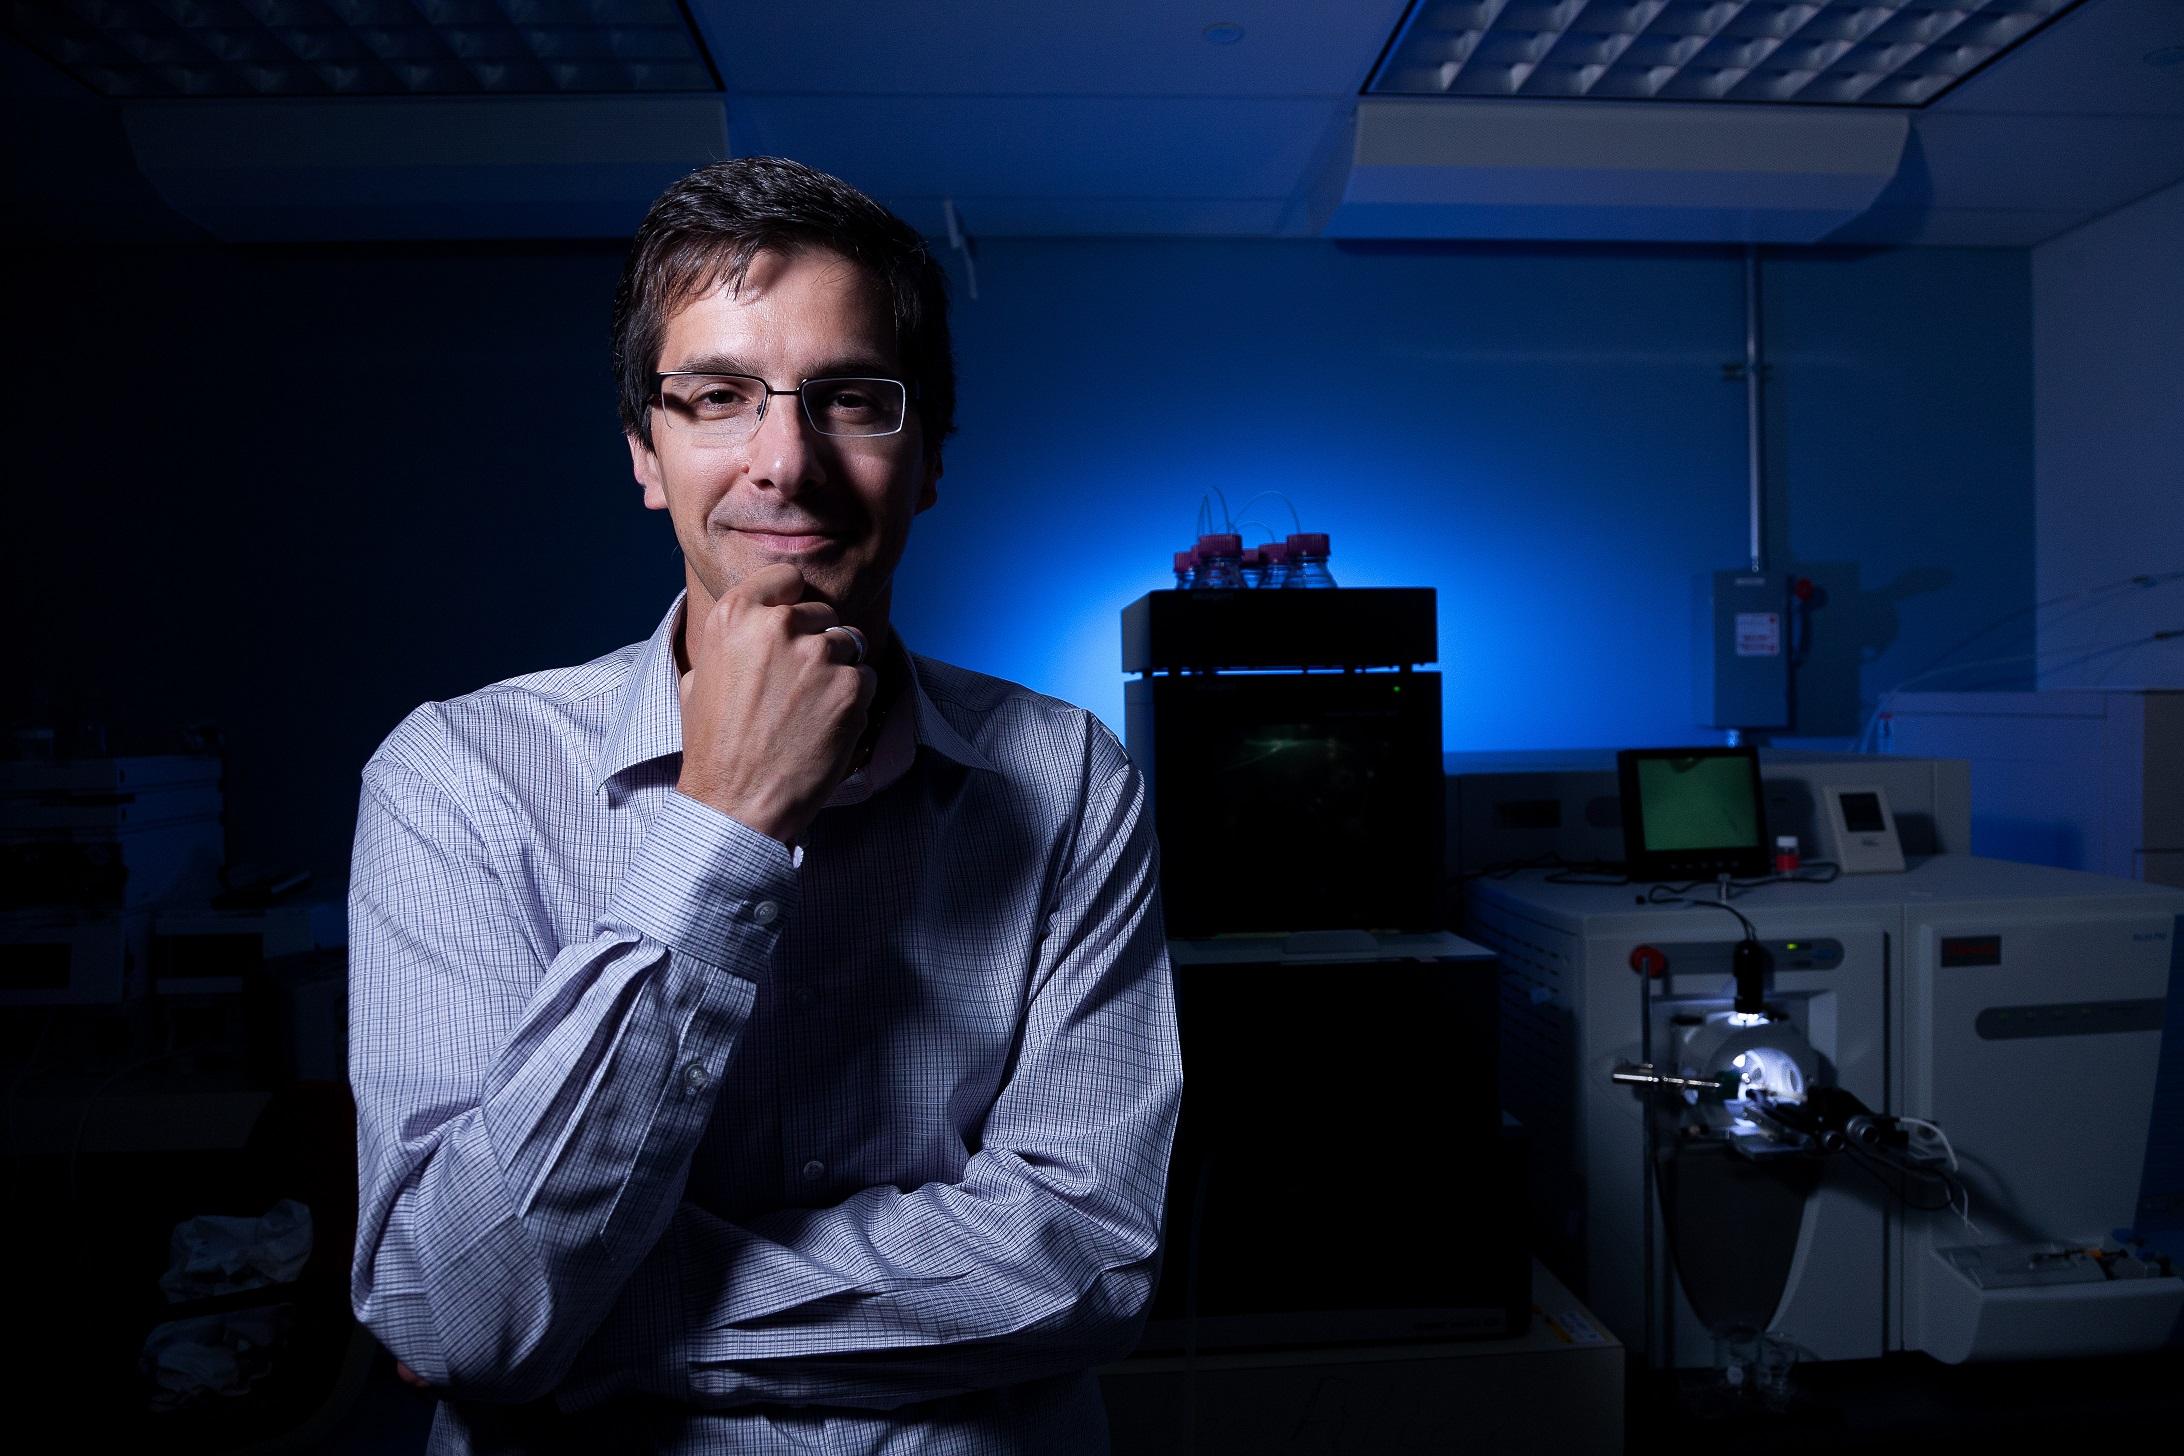 Daniel Figeys, uOttawa Professor standing beside high tech equipement